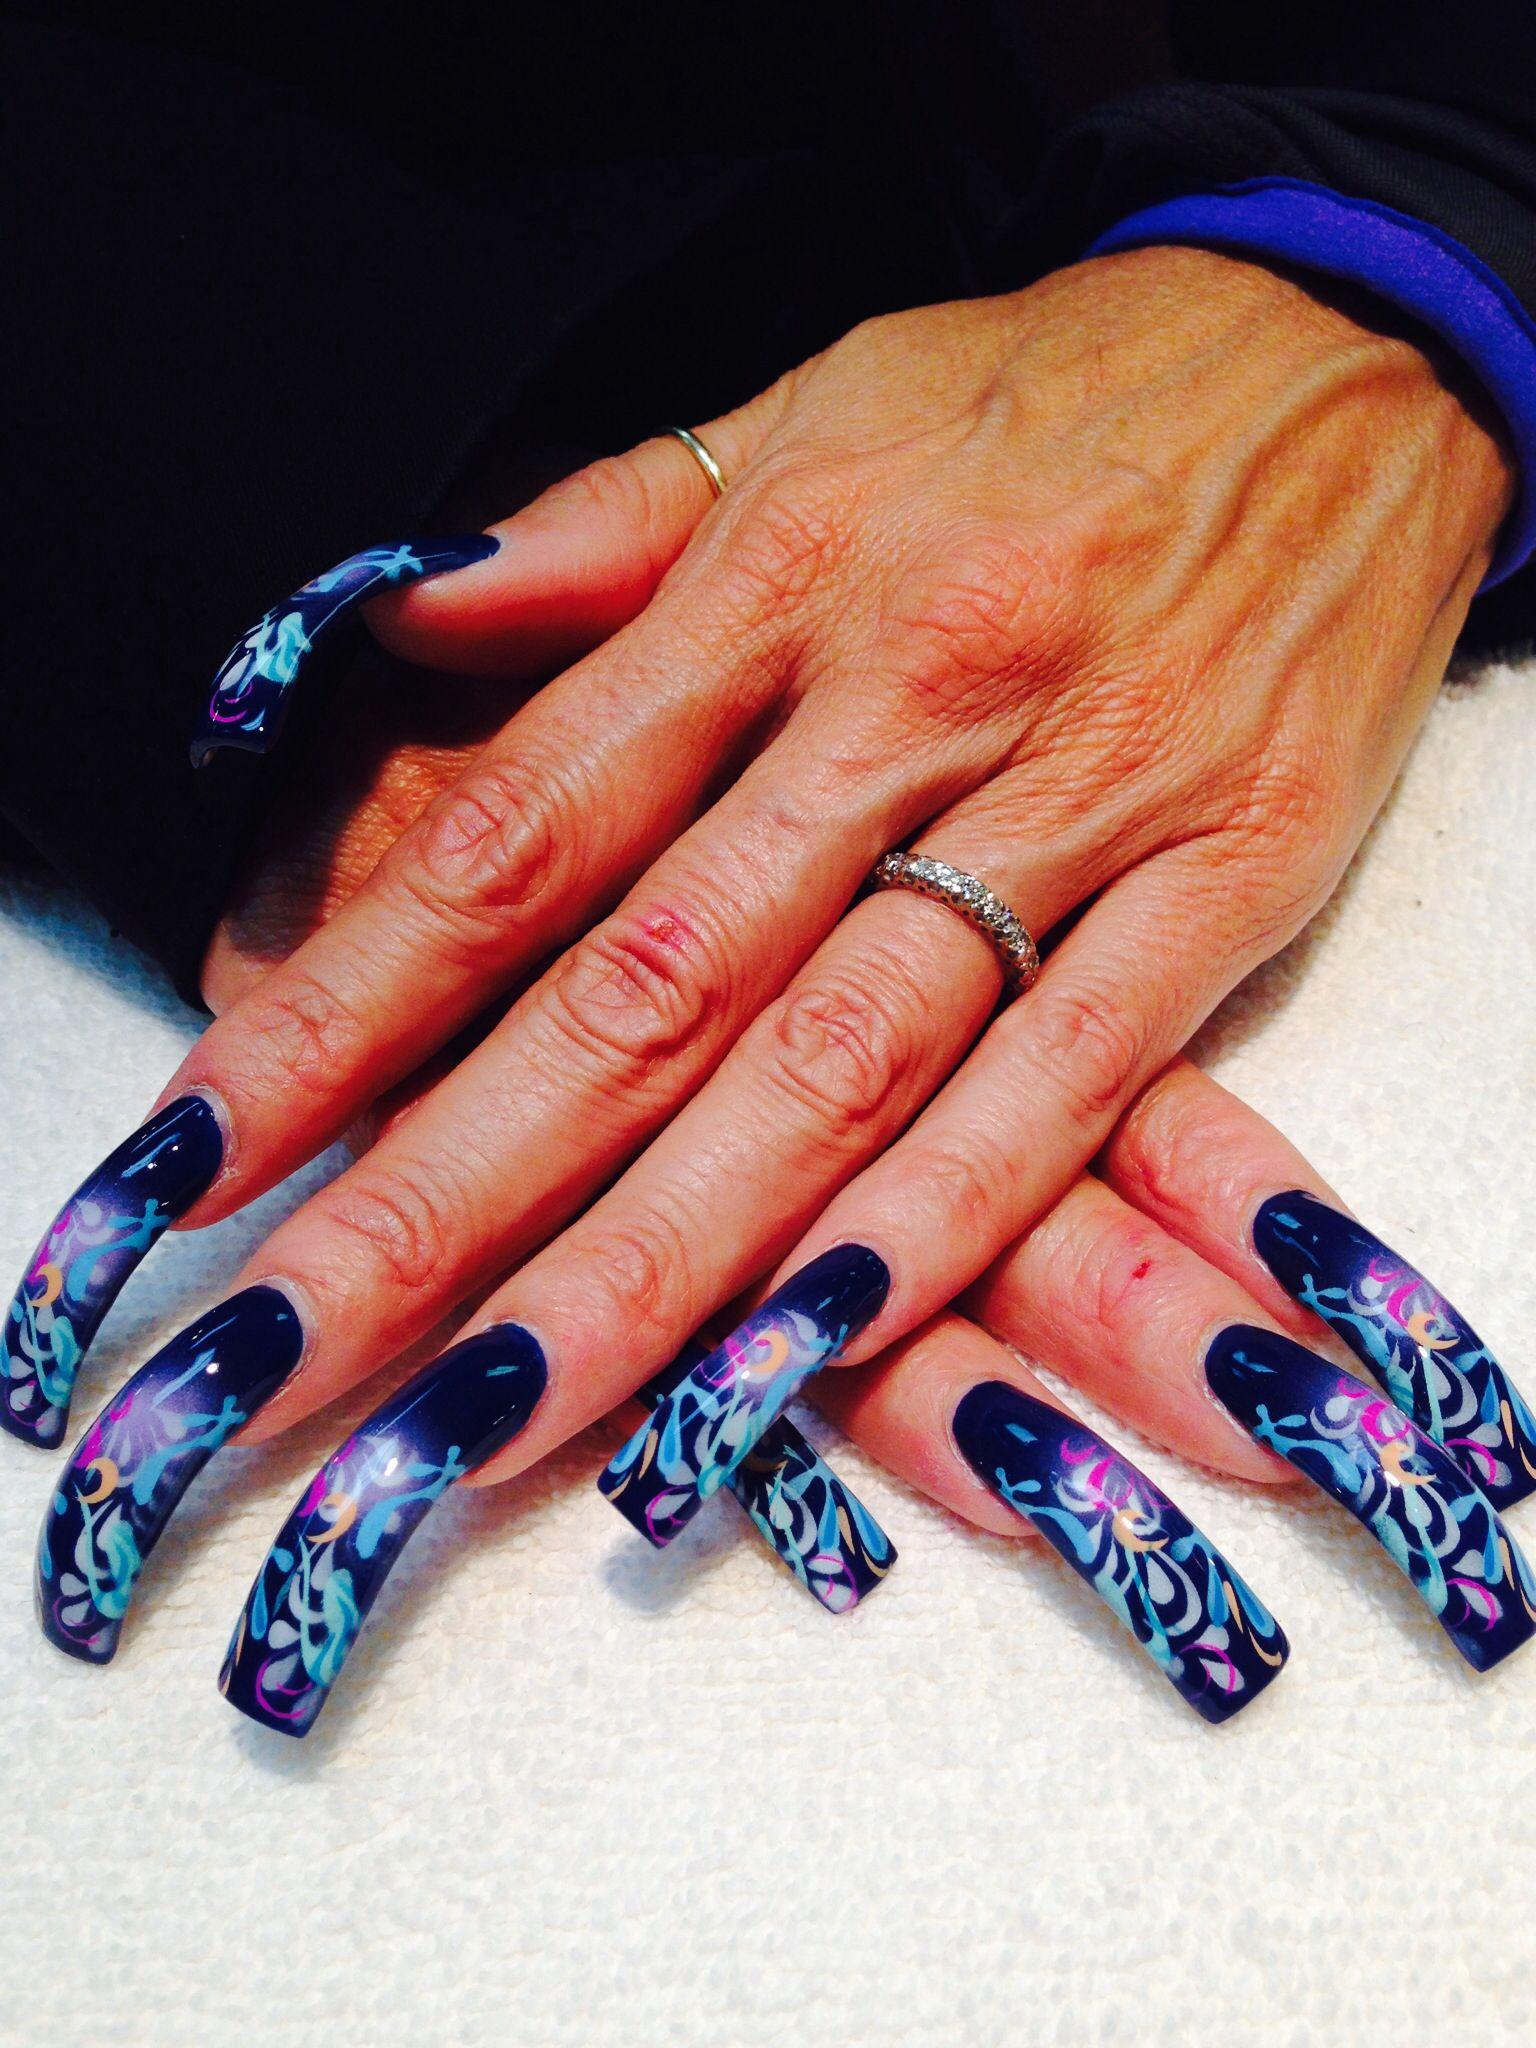 blue airbrush nails